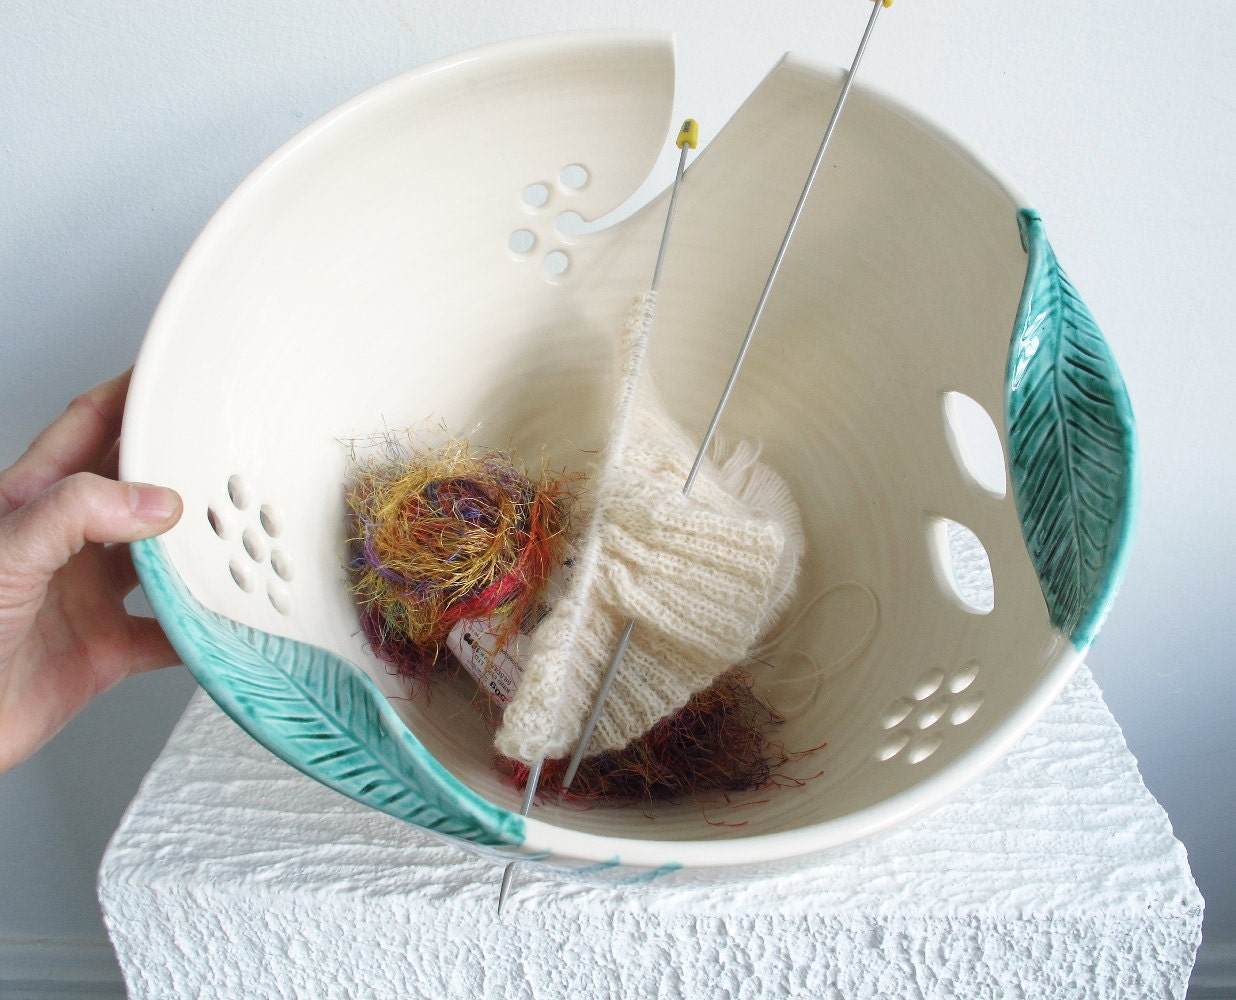 Knitting Yarn Bowl : Yarn bowl jumbo extra large knitting ceramic holder